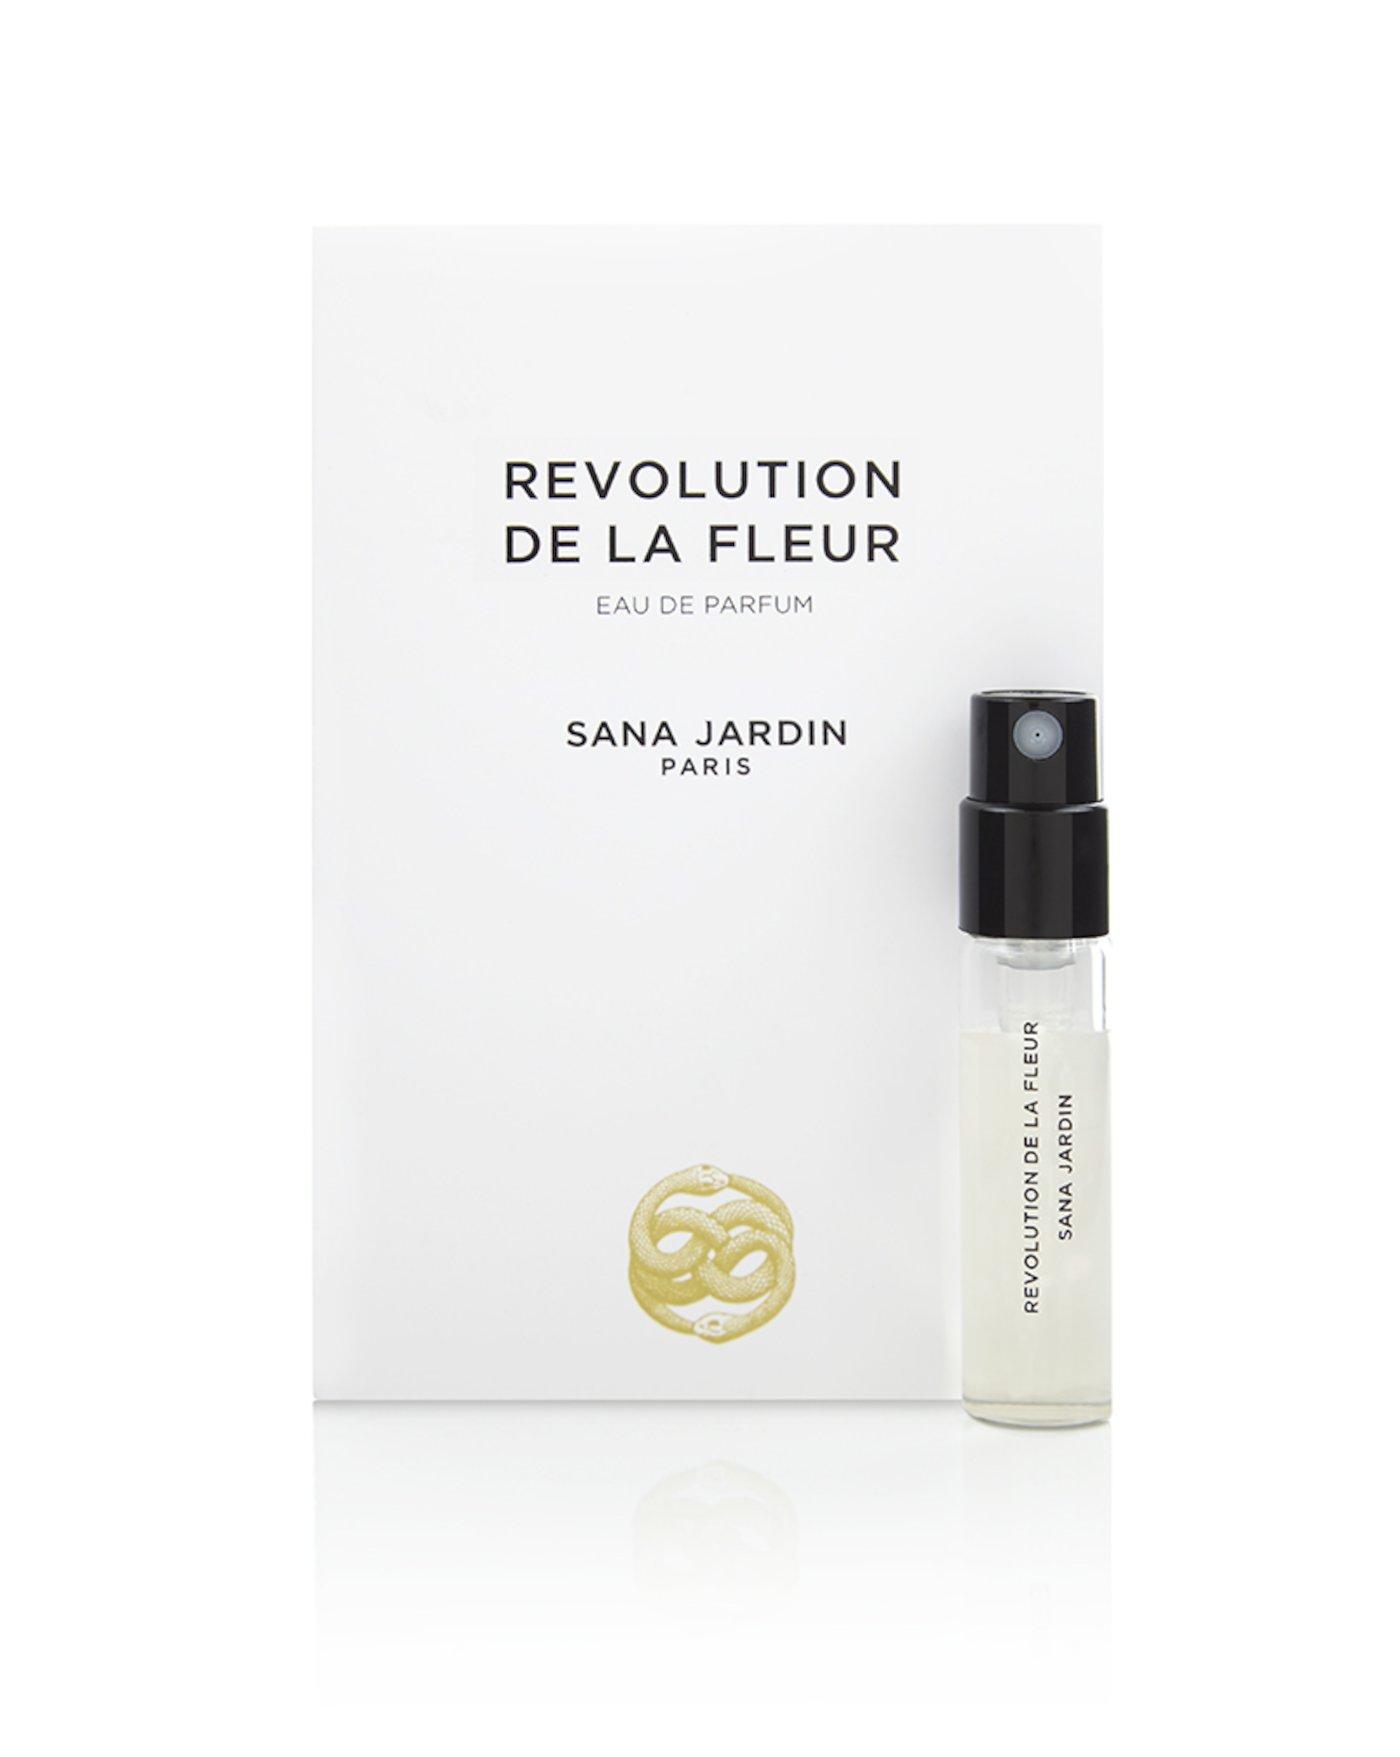 Revolution de la Fleur 2ml in card